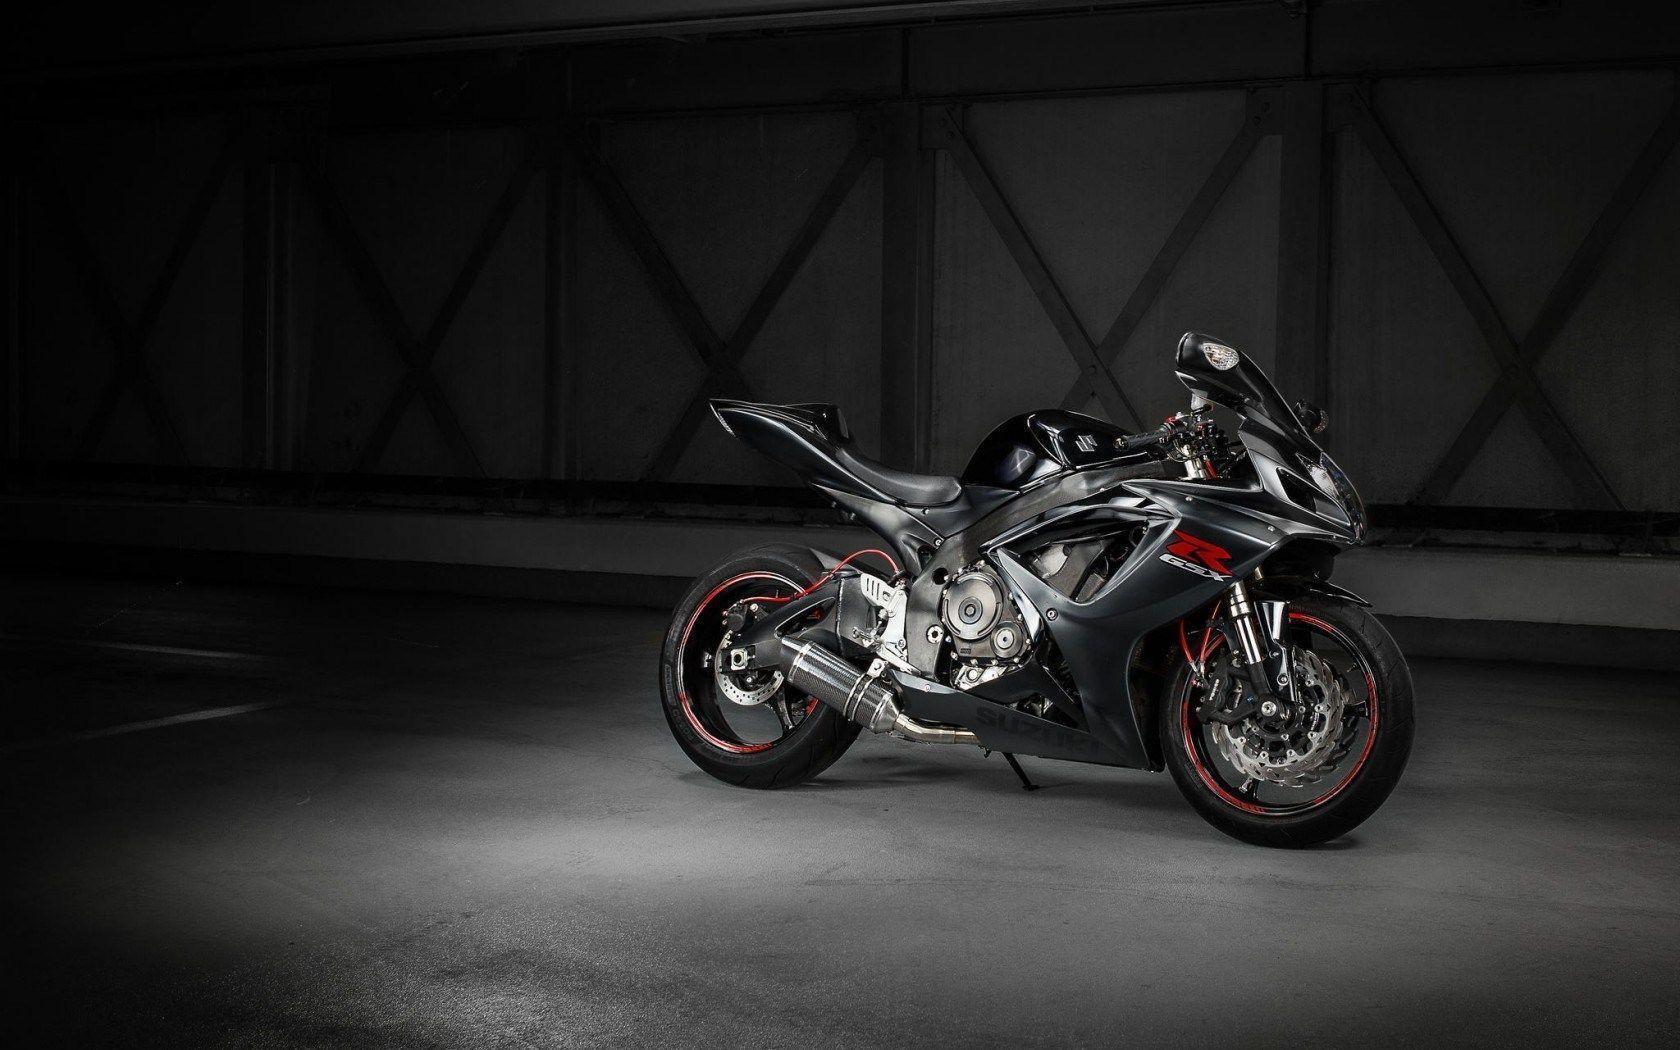 suzuki motocross bike hd - photo #44